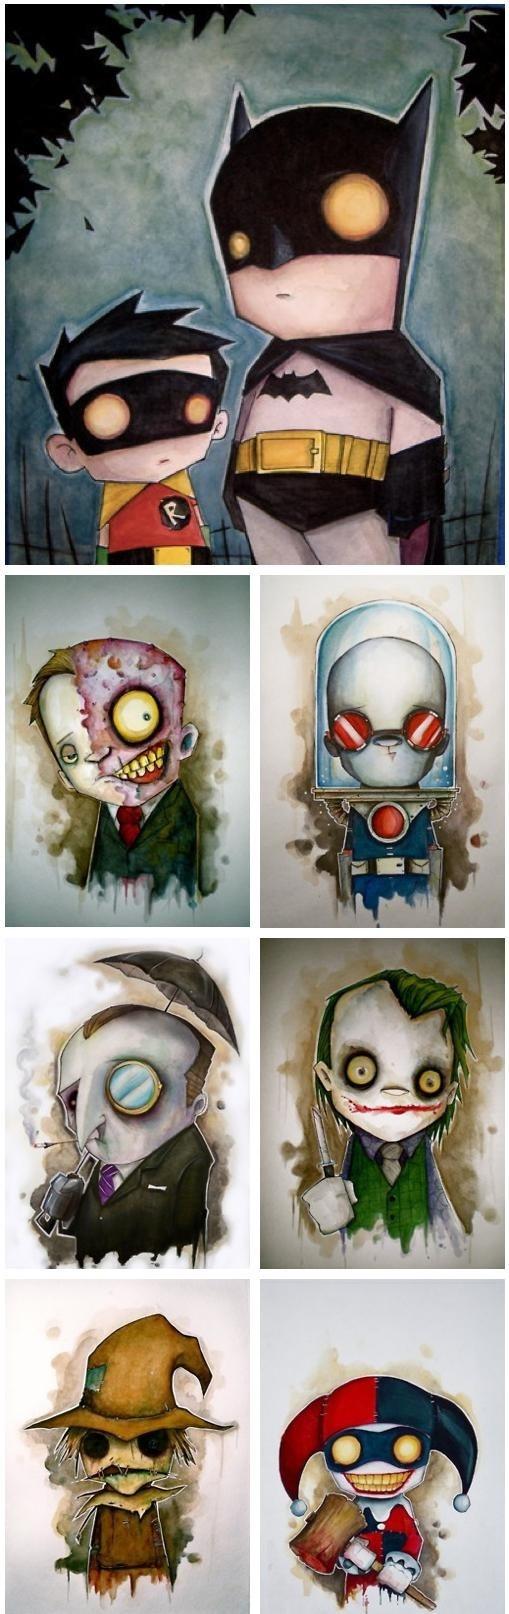 Batman Space Invader Zim styleThe Joker, Comics Art, Comics Book, Tim Burton, Batman Robin, Batman Art, Superhero, Cartoons Drawing, Harley Quinn